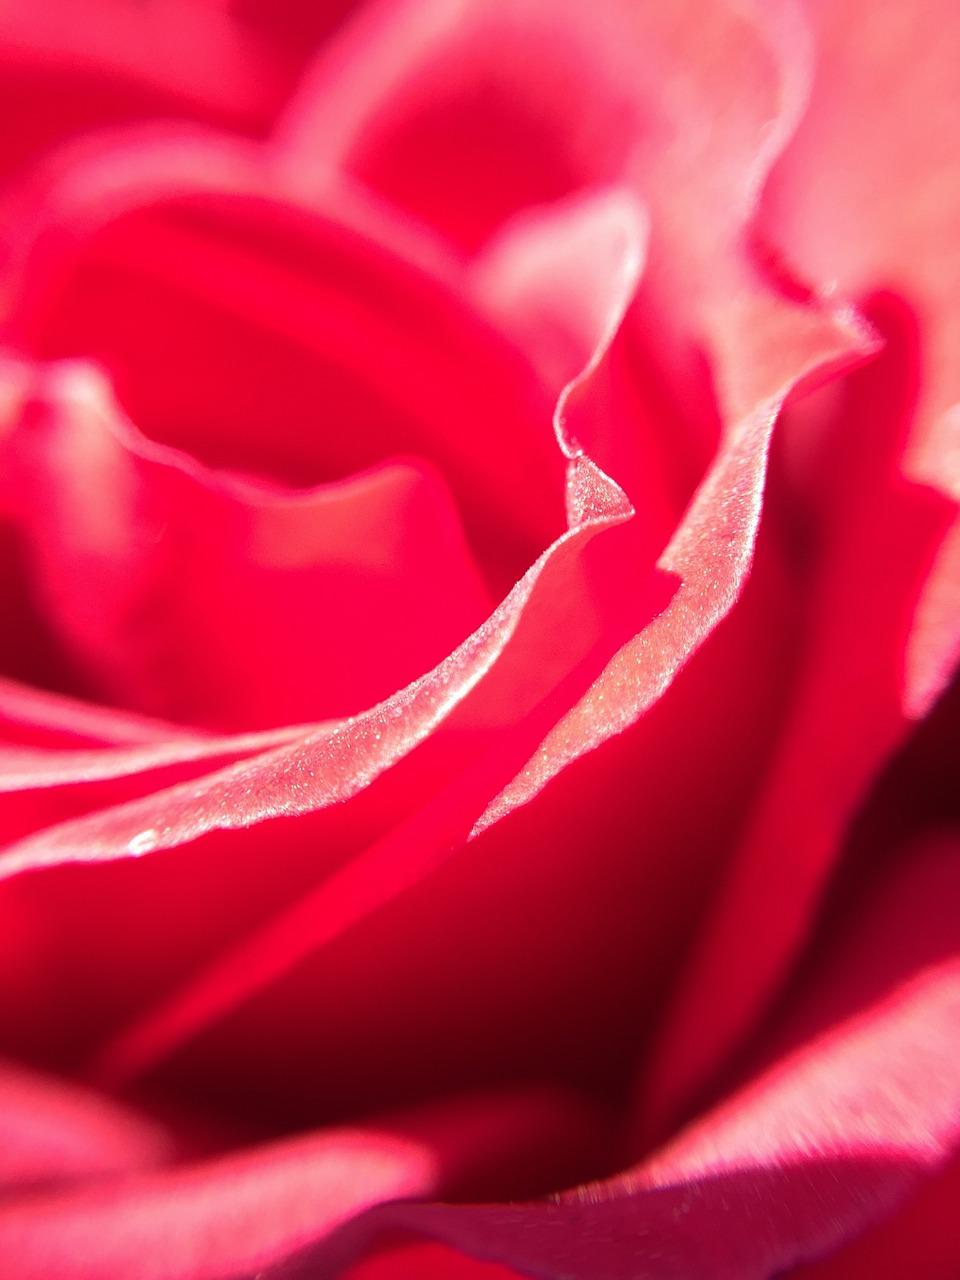 Rosaredbeautifulred Roseflower Free Photo From Needpix